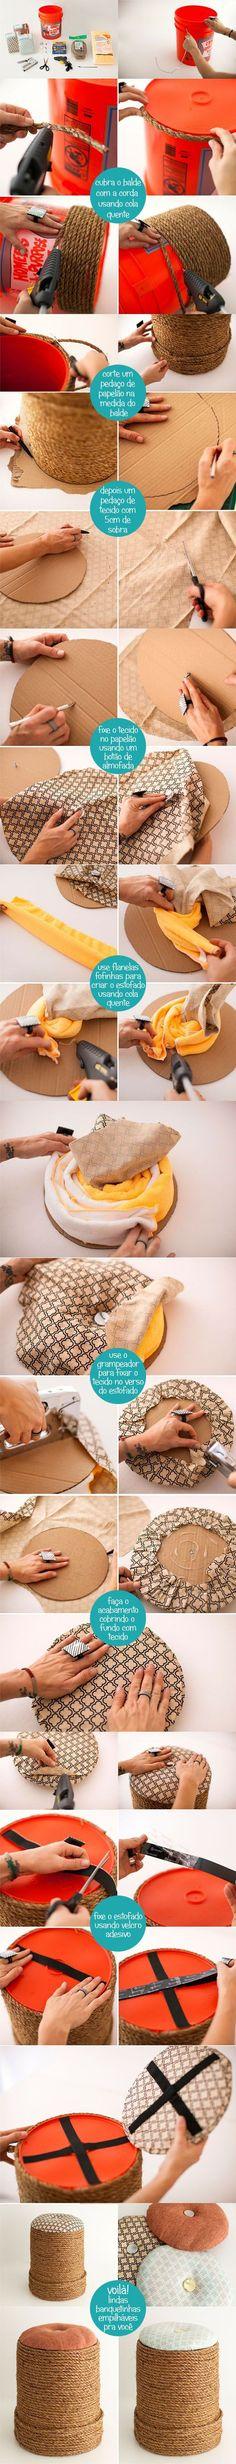 DIY – Passo a Passo: Baldes de plástico viram banquetas